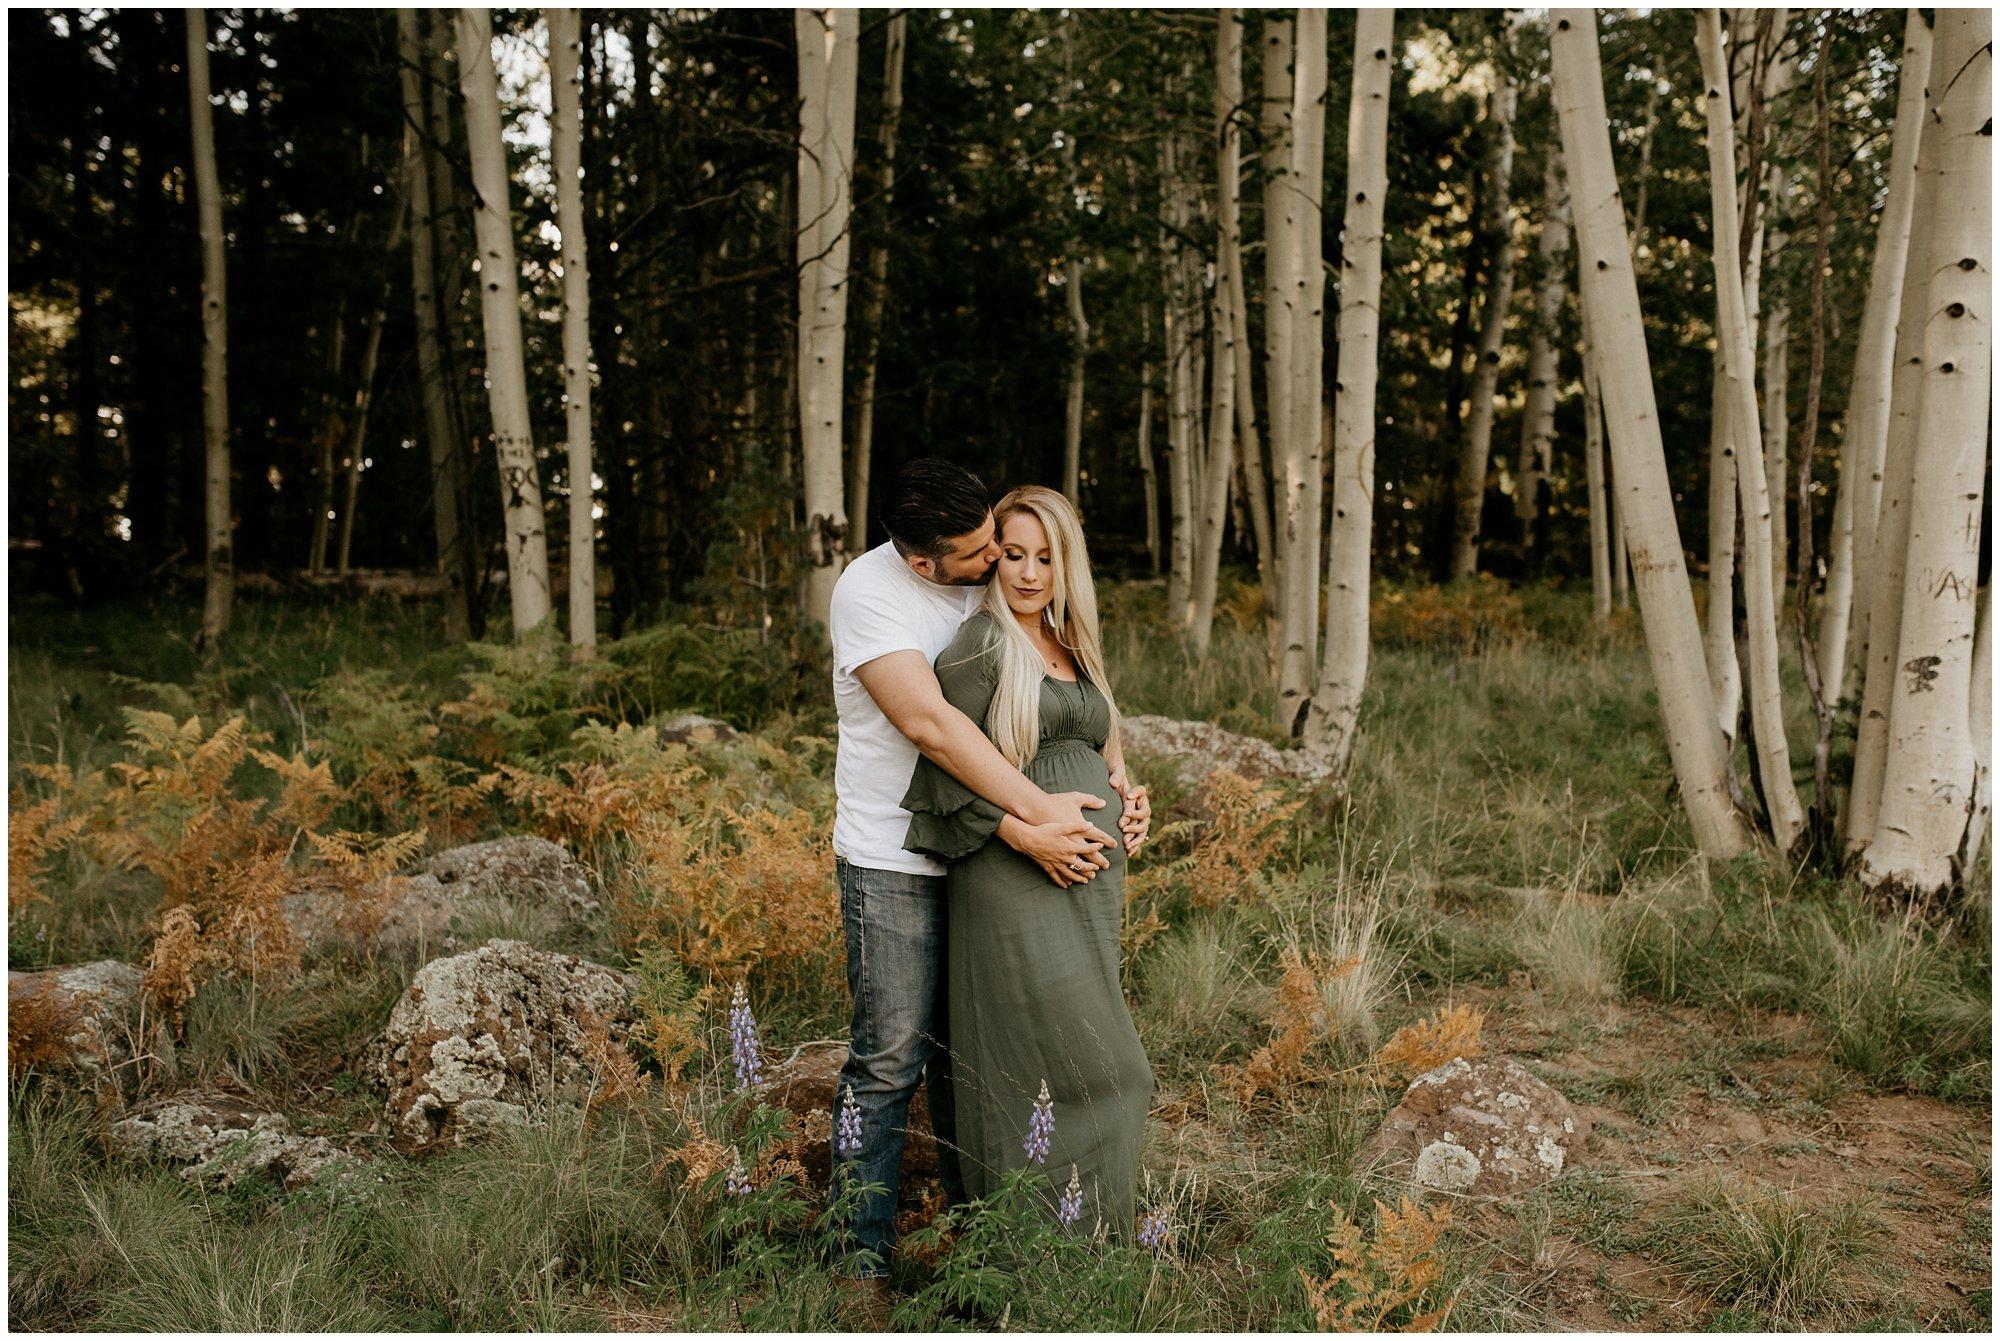 Flagstaff Aspen Tree Portrait Session - Gabby + Gary - Ashtyn Nicole Photo_0010.jpg